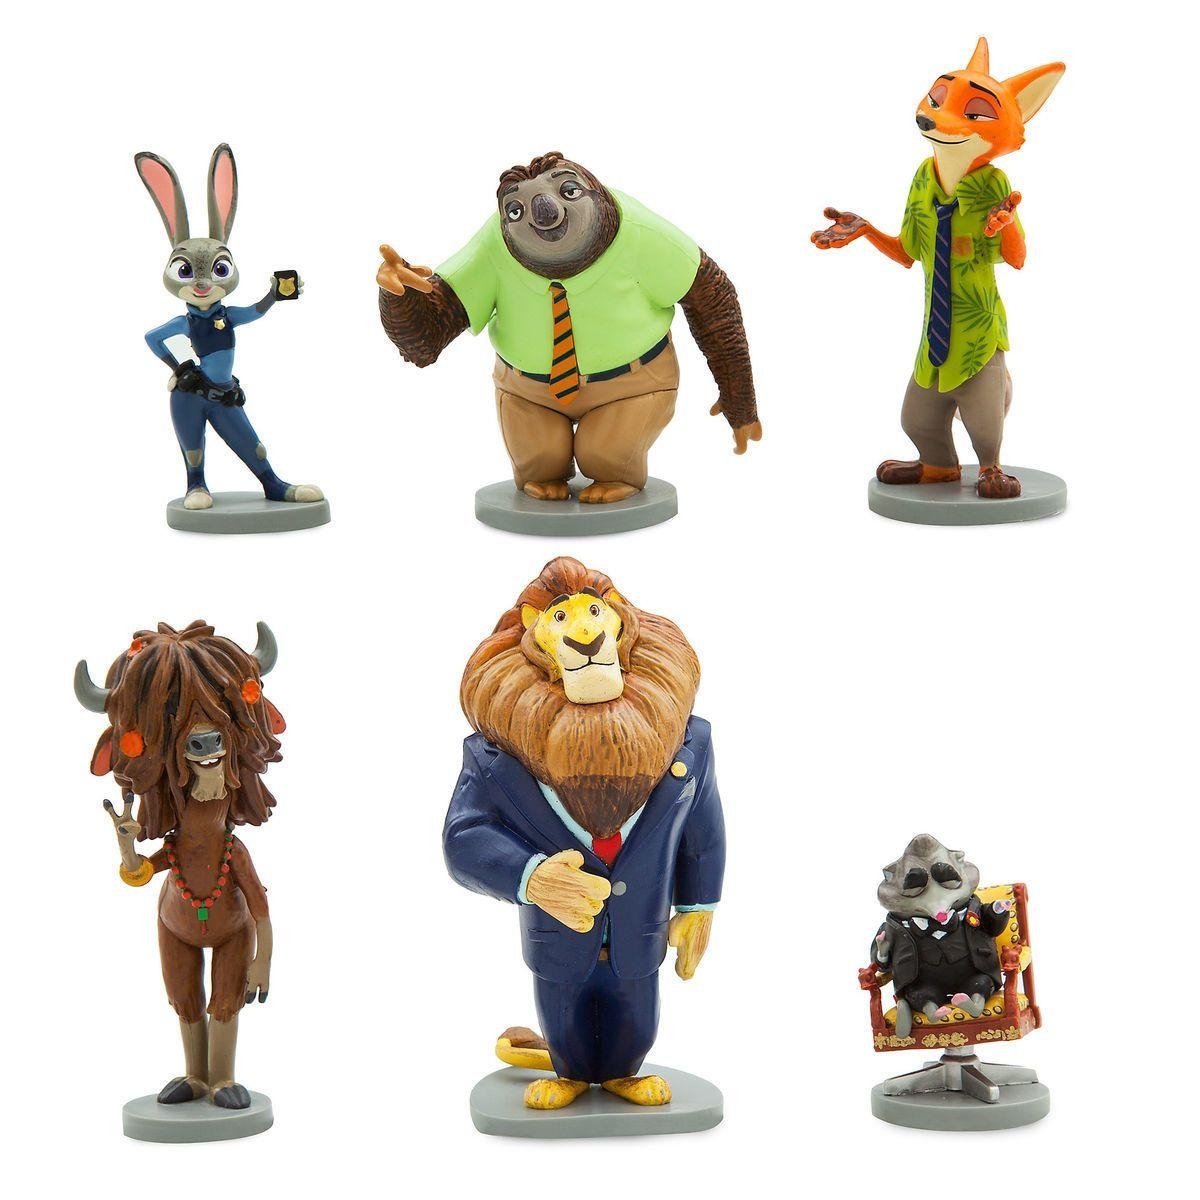 Disney Store Игровой набор с фигурками Зверополис Zootopia Exclusive 6-Piece PVC Figure Play Set